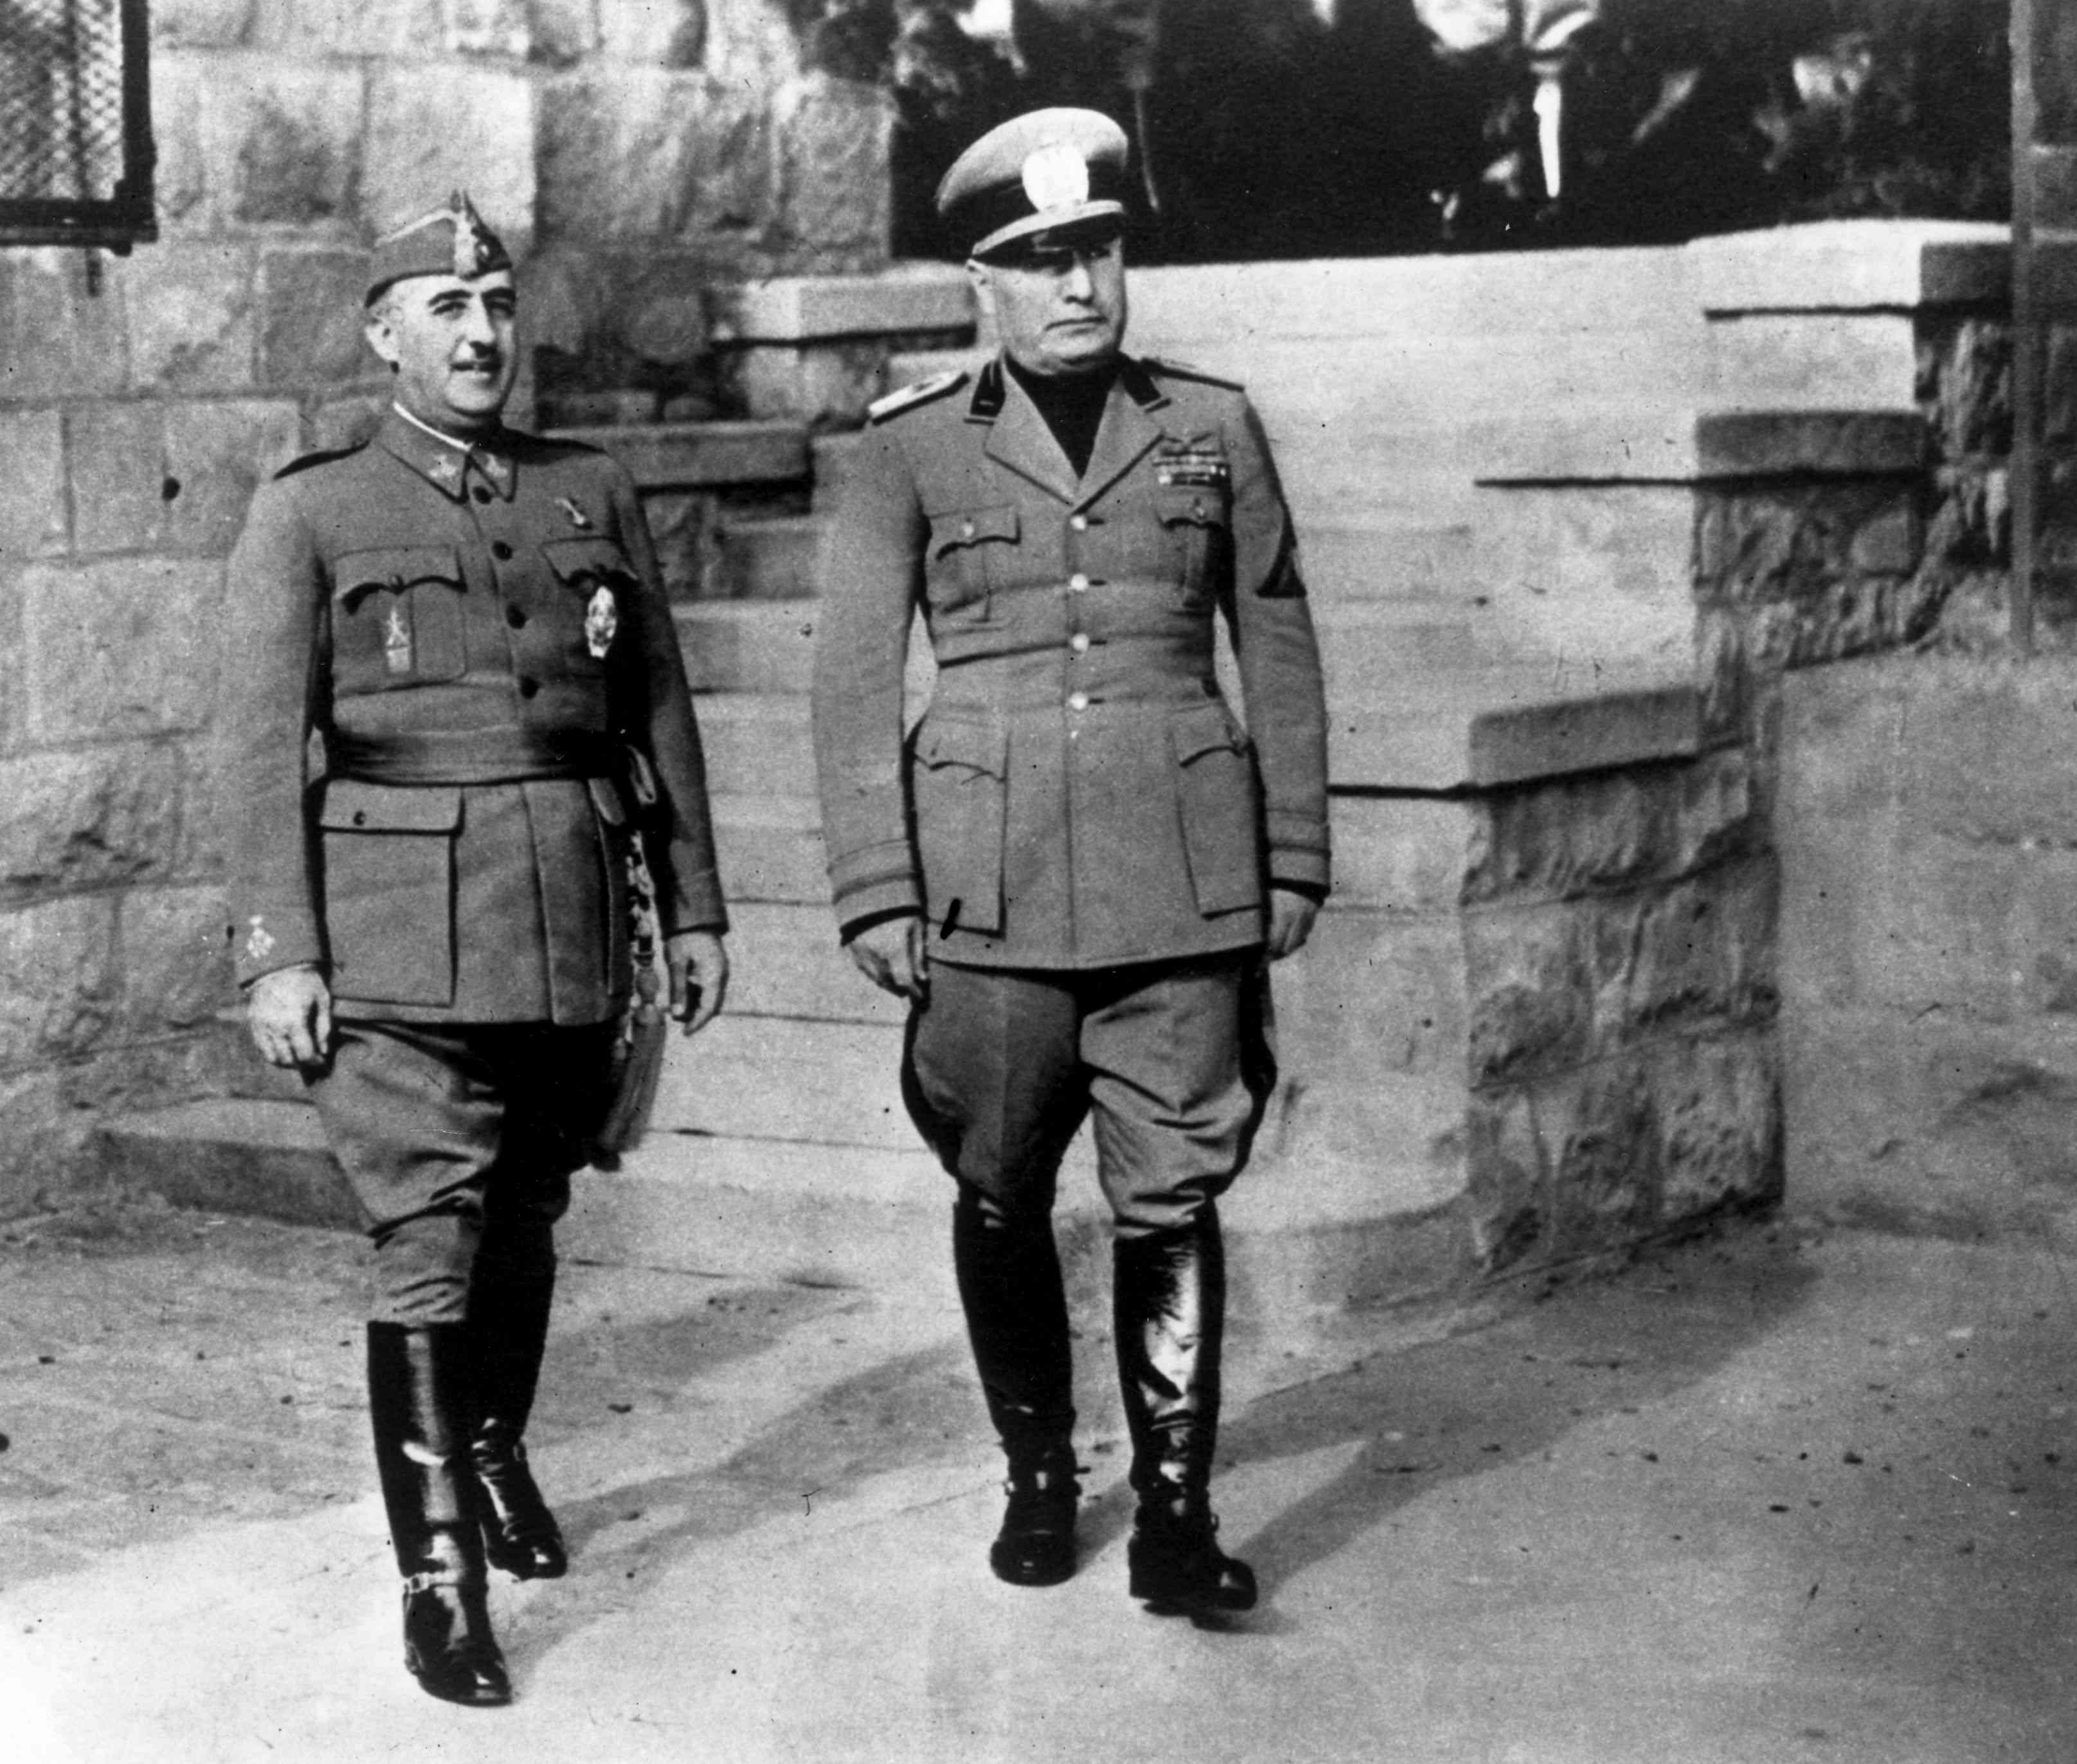 Spanish authoritarian leader Francisco Franco (left) with Italian dictator Benito Mussolini, March 4, 1944